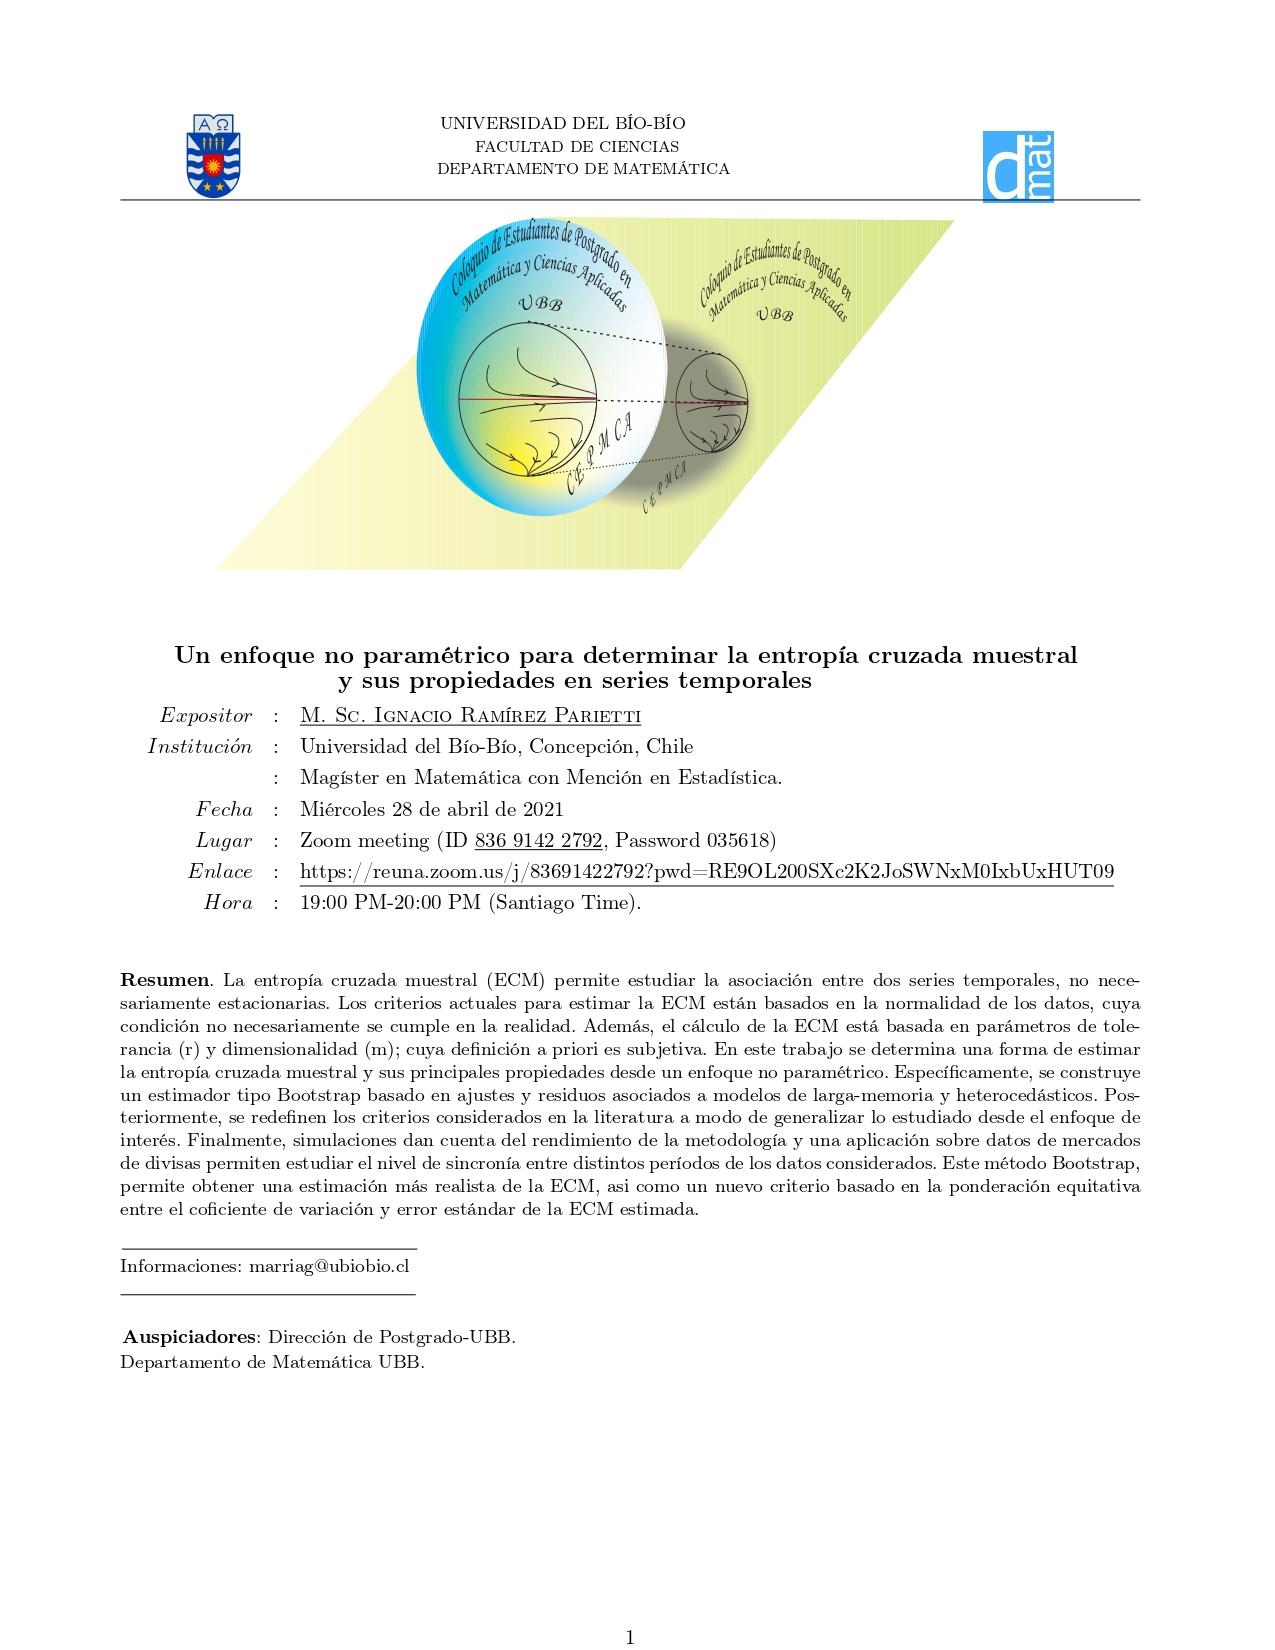 coloquio-cemca_ignacio-28_4_21_page-0001